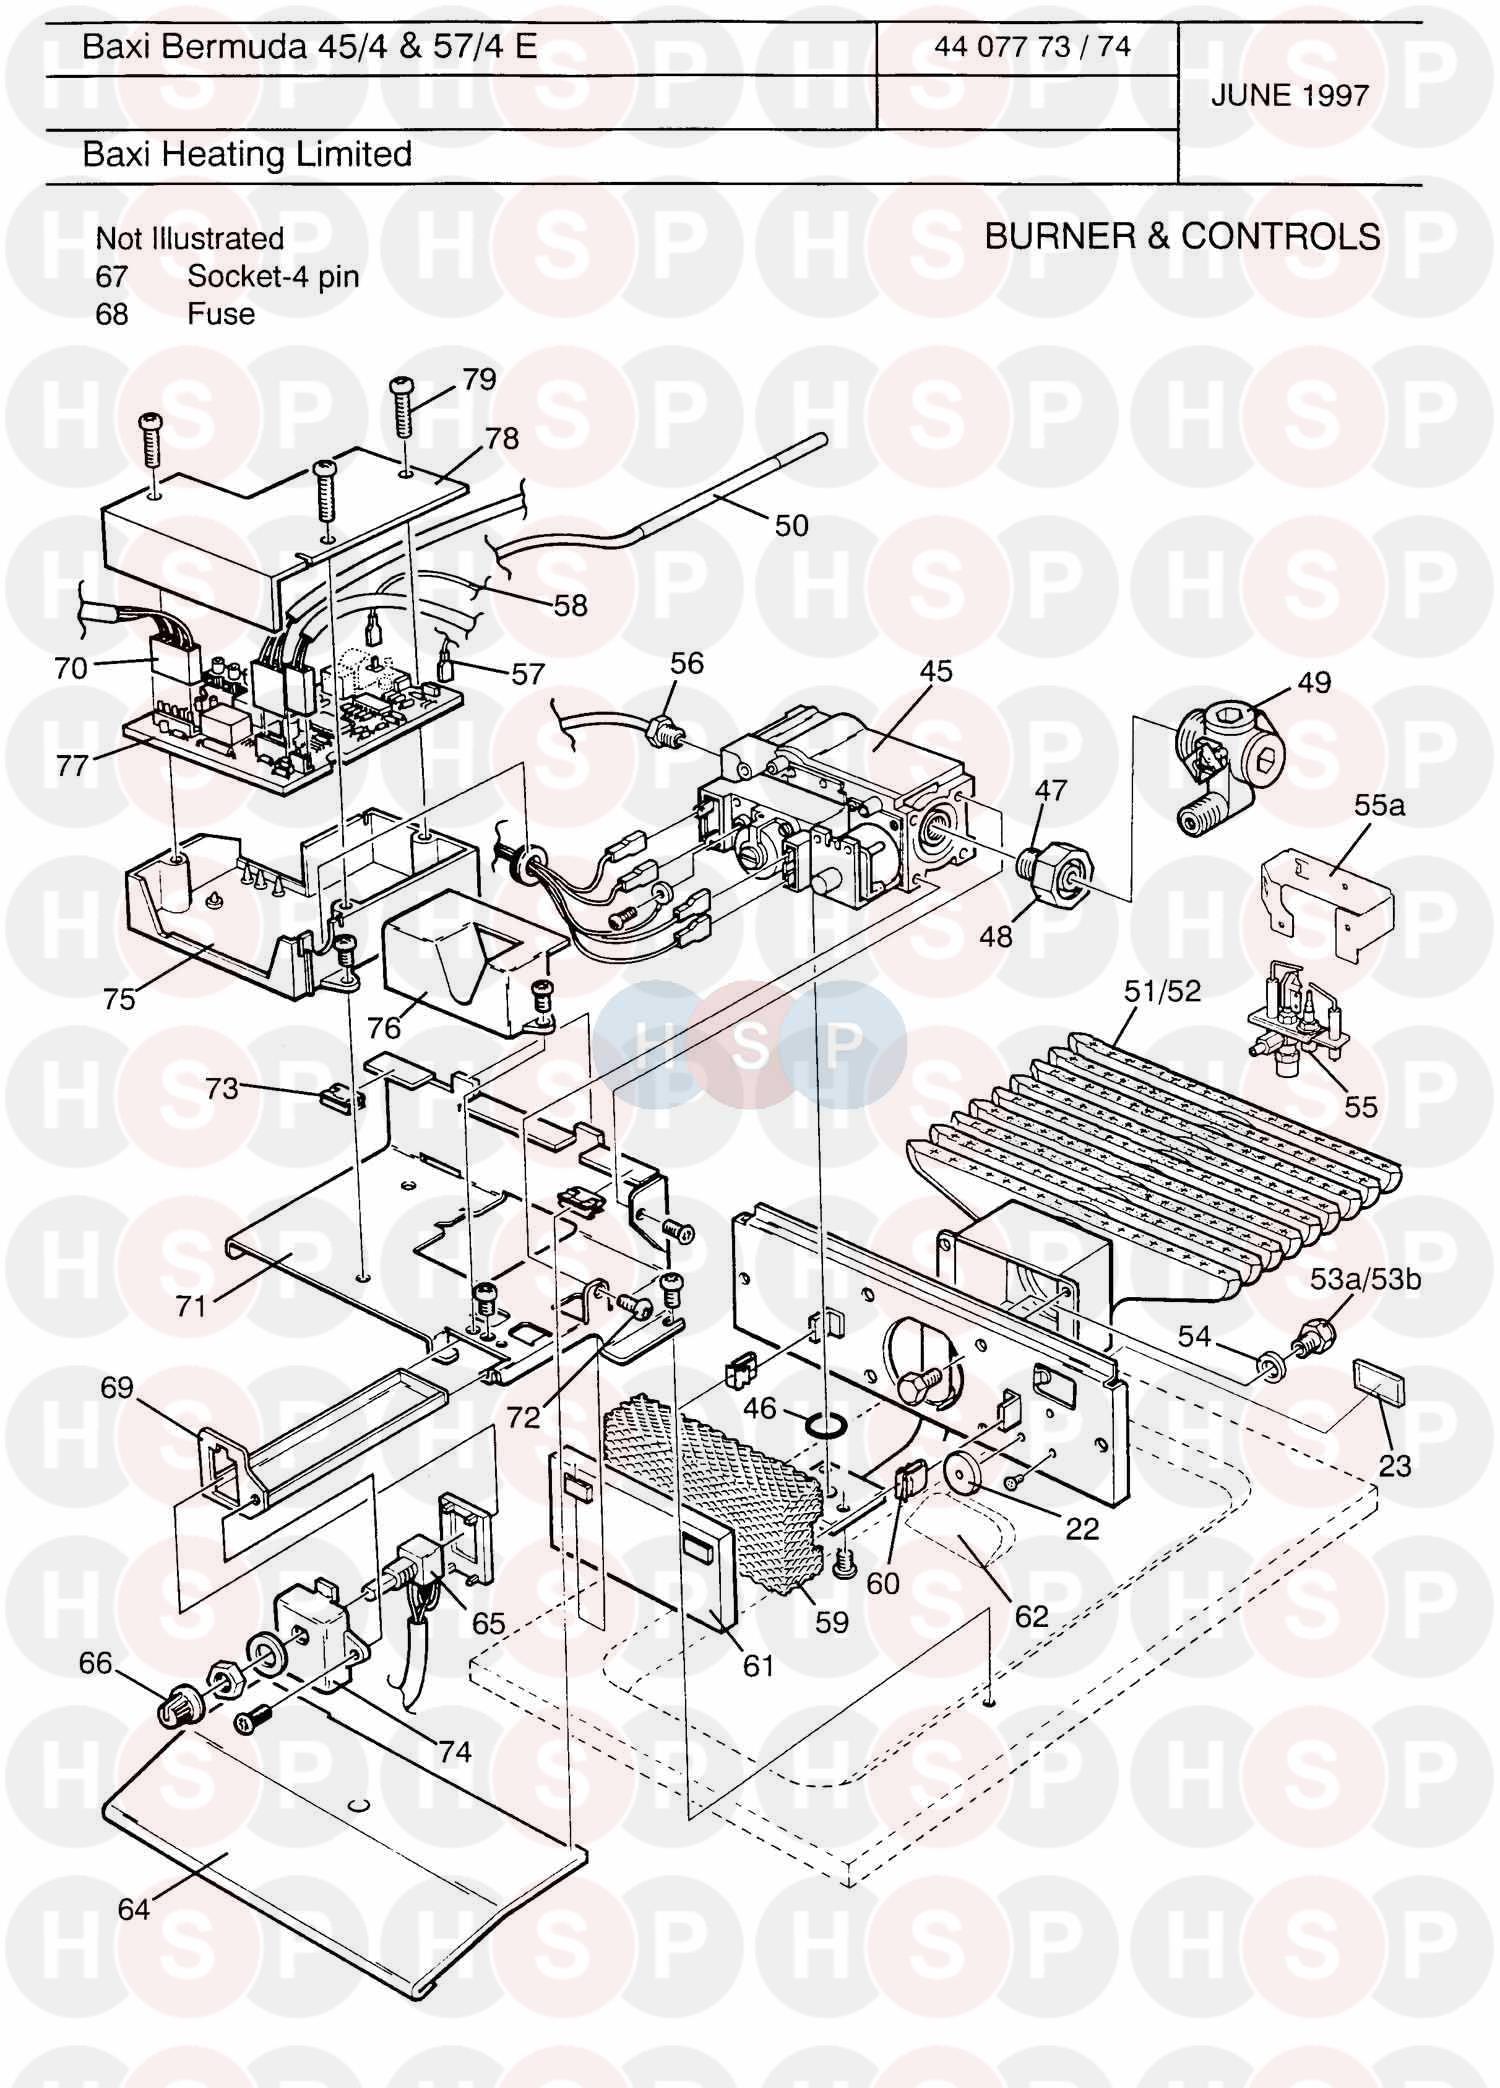 baxi bermuda 45  4 electronic appliance diagram  burner